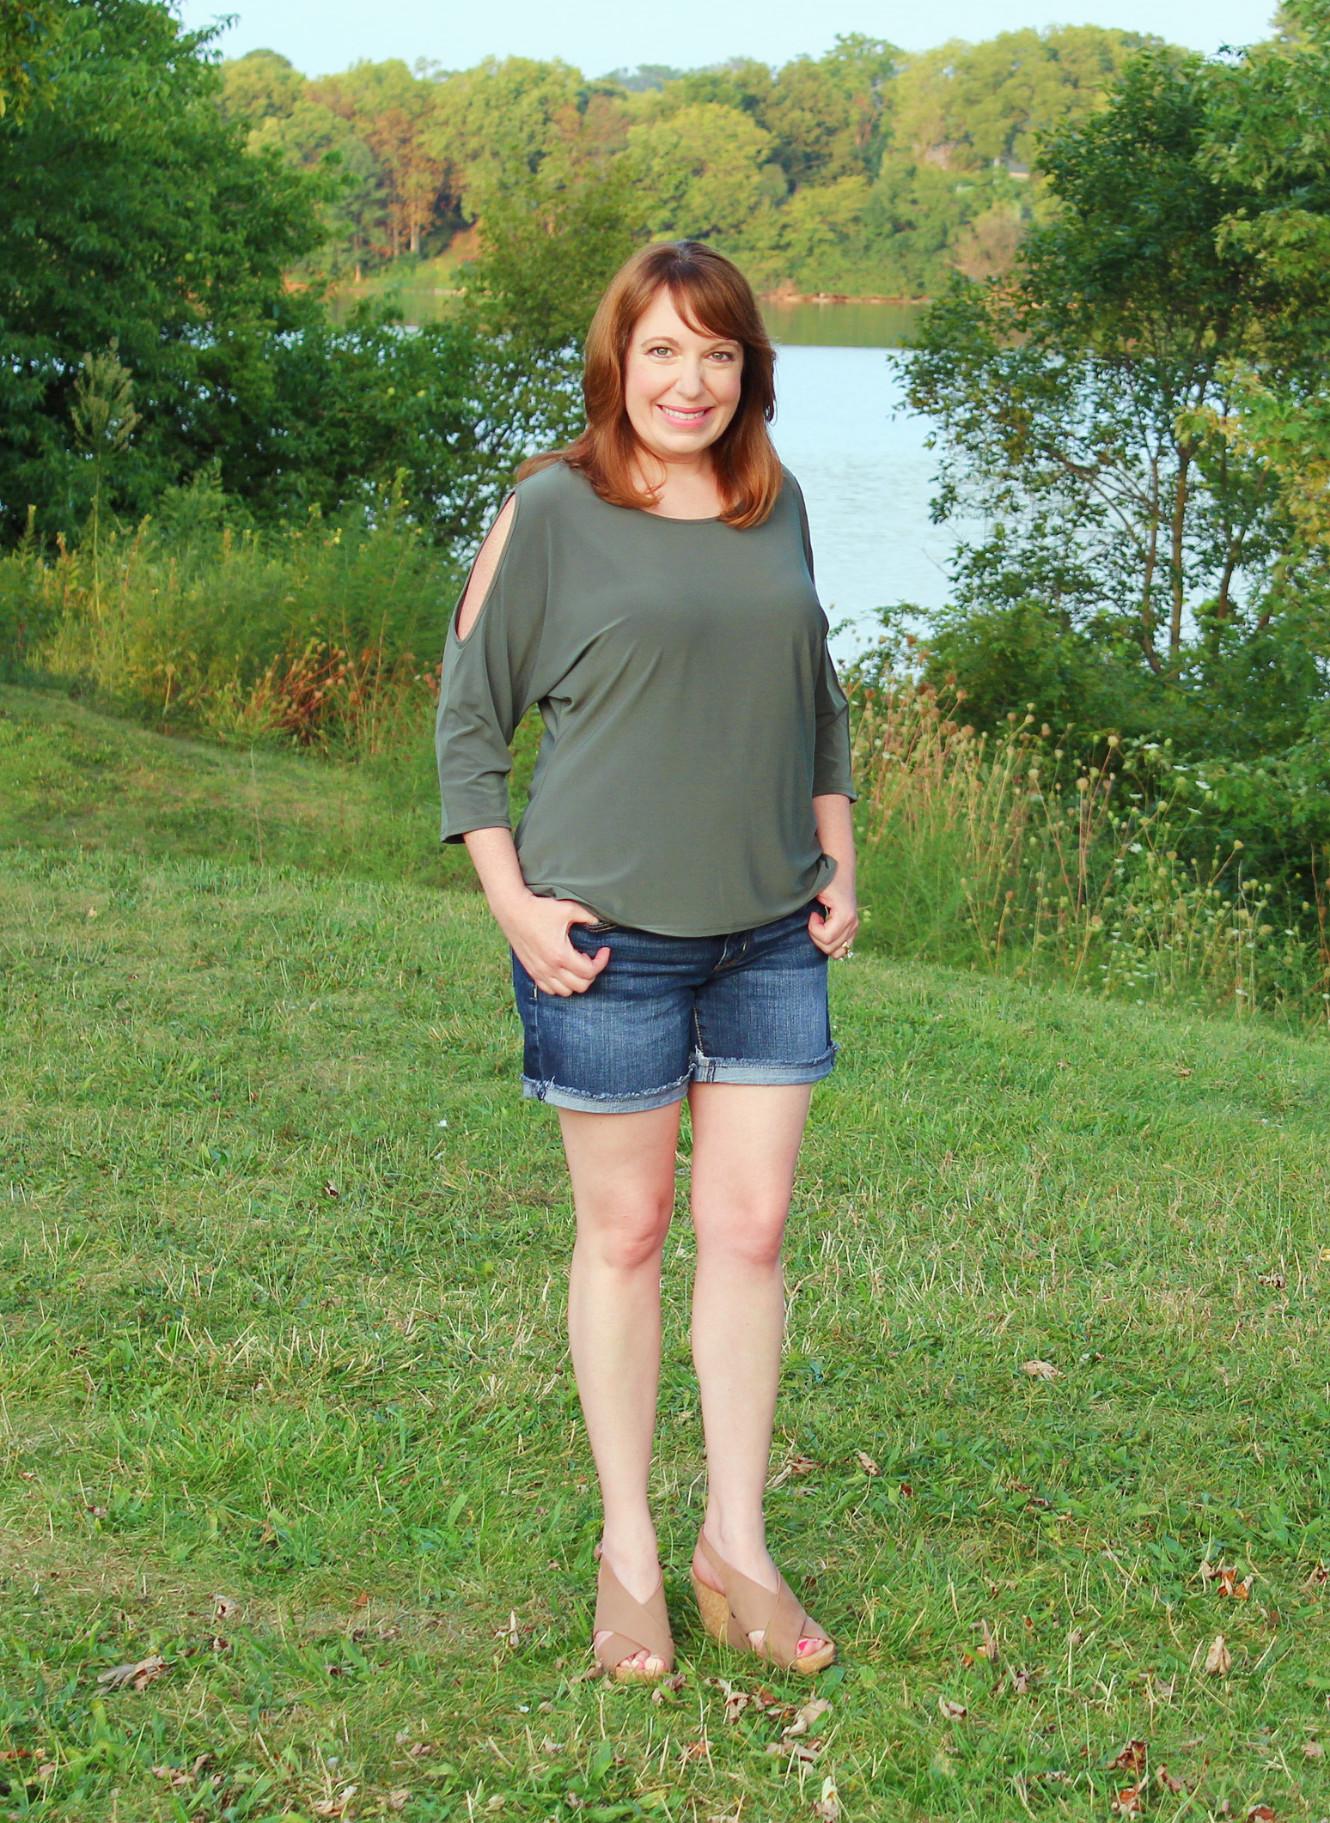 Split Sleeve Green Shirt With Jean Shorts